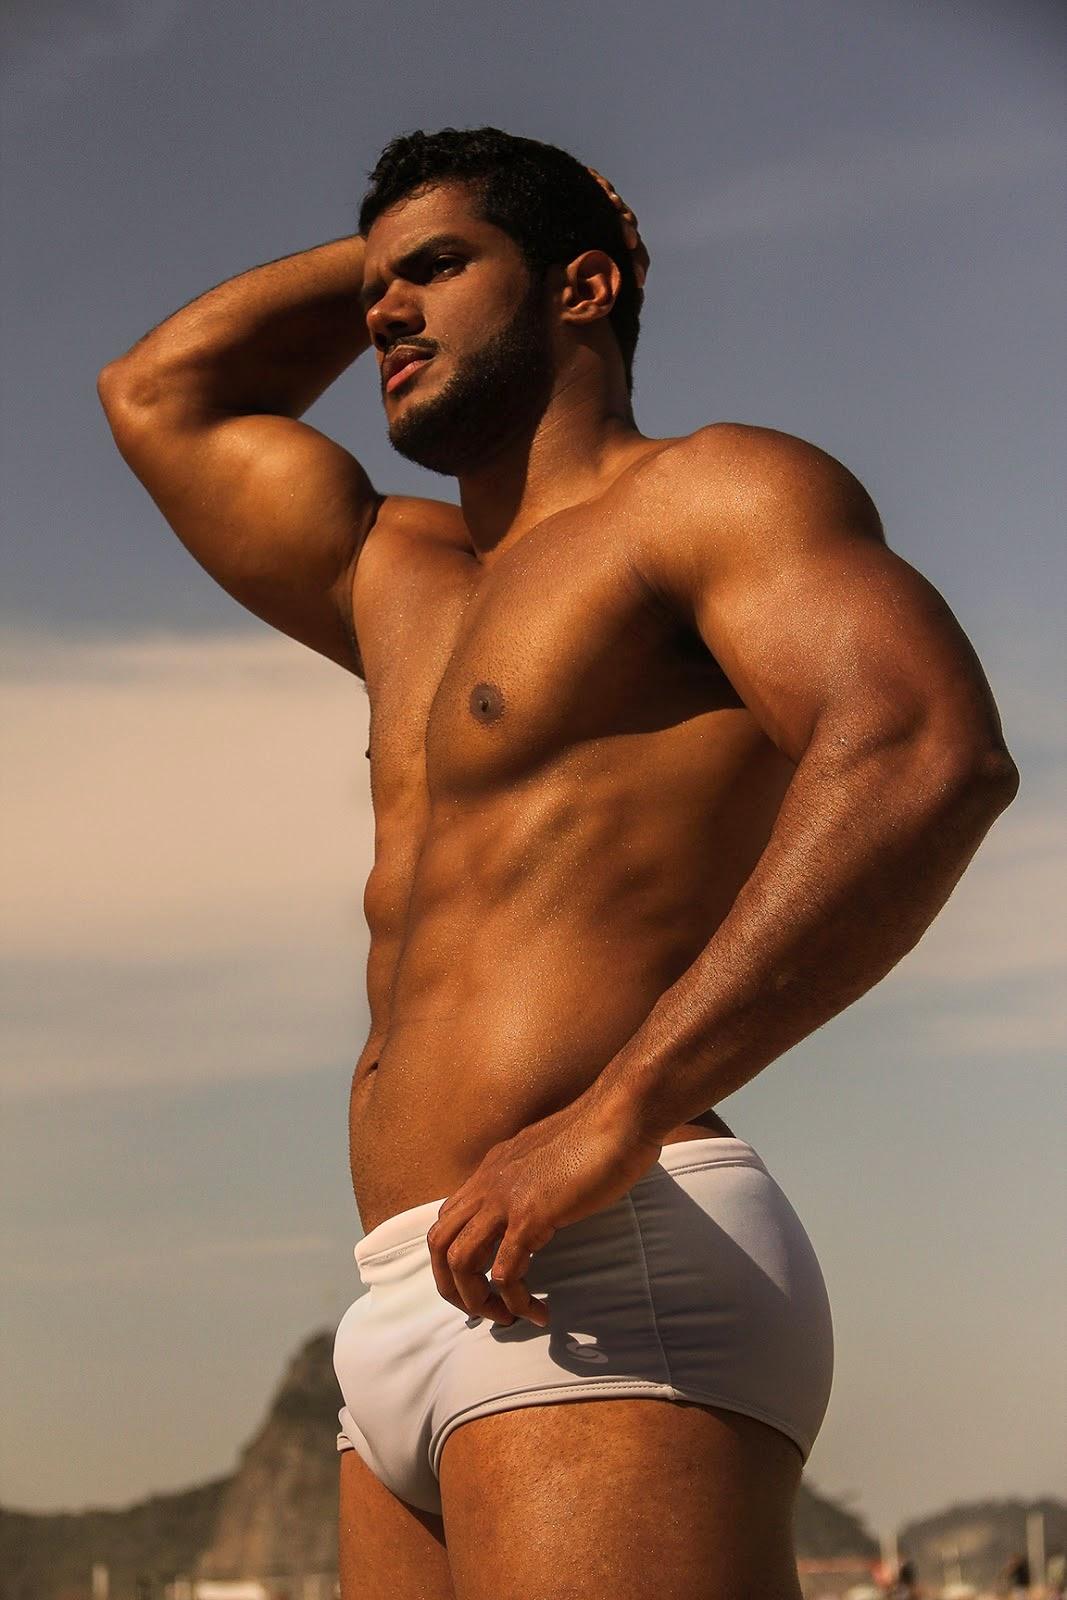 Vídeo Gay Online do Sósia do Jogador Hulk na Punheta